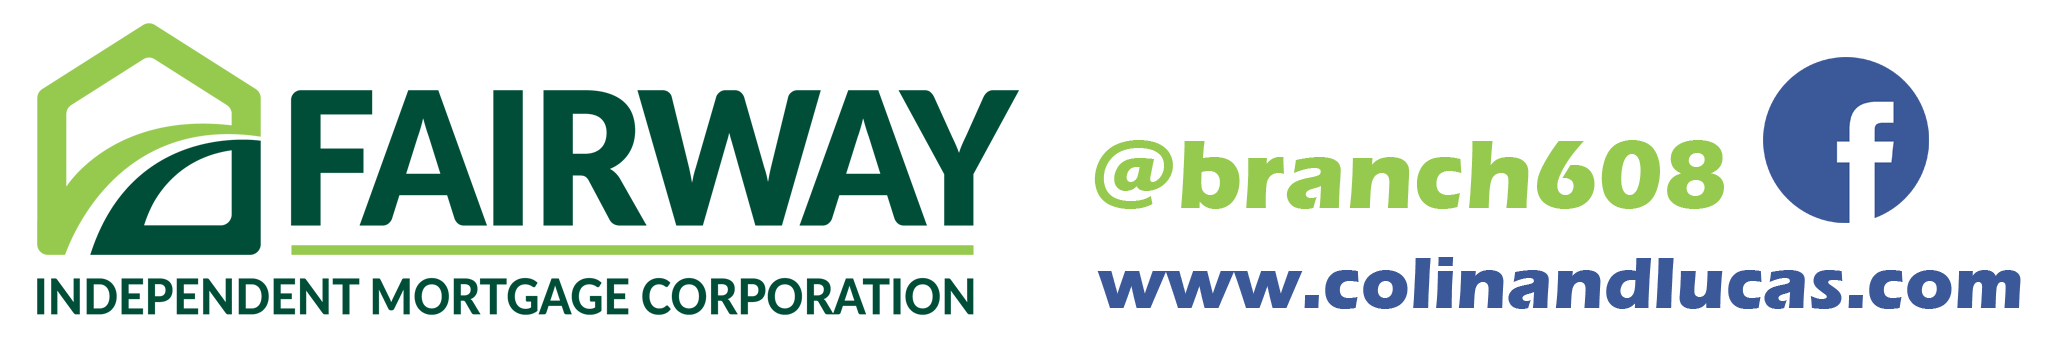 Sponsor Fairway Independent Mortgage  Branch 608